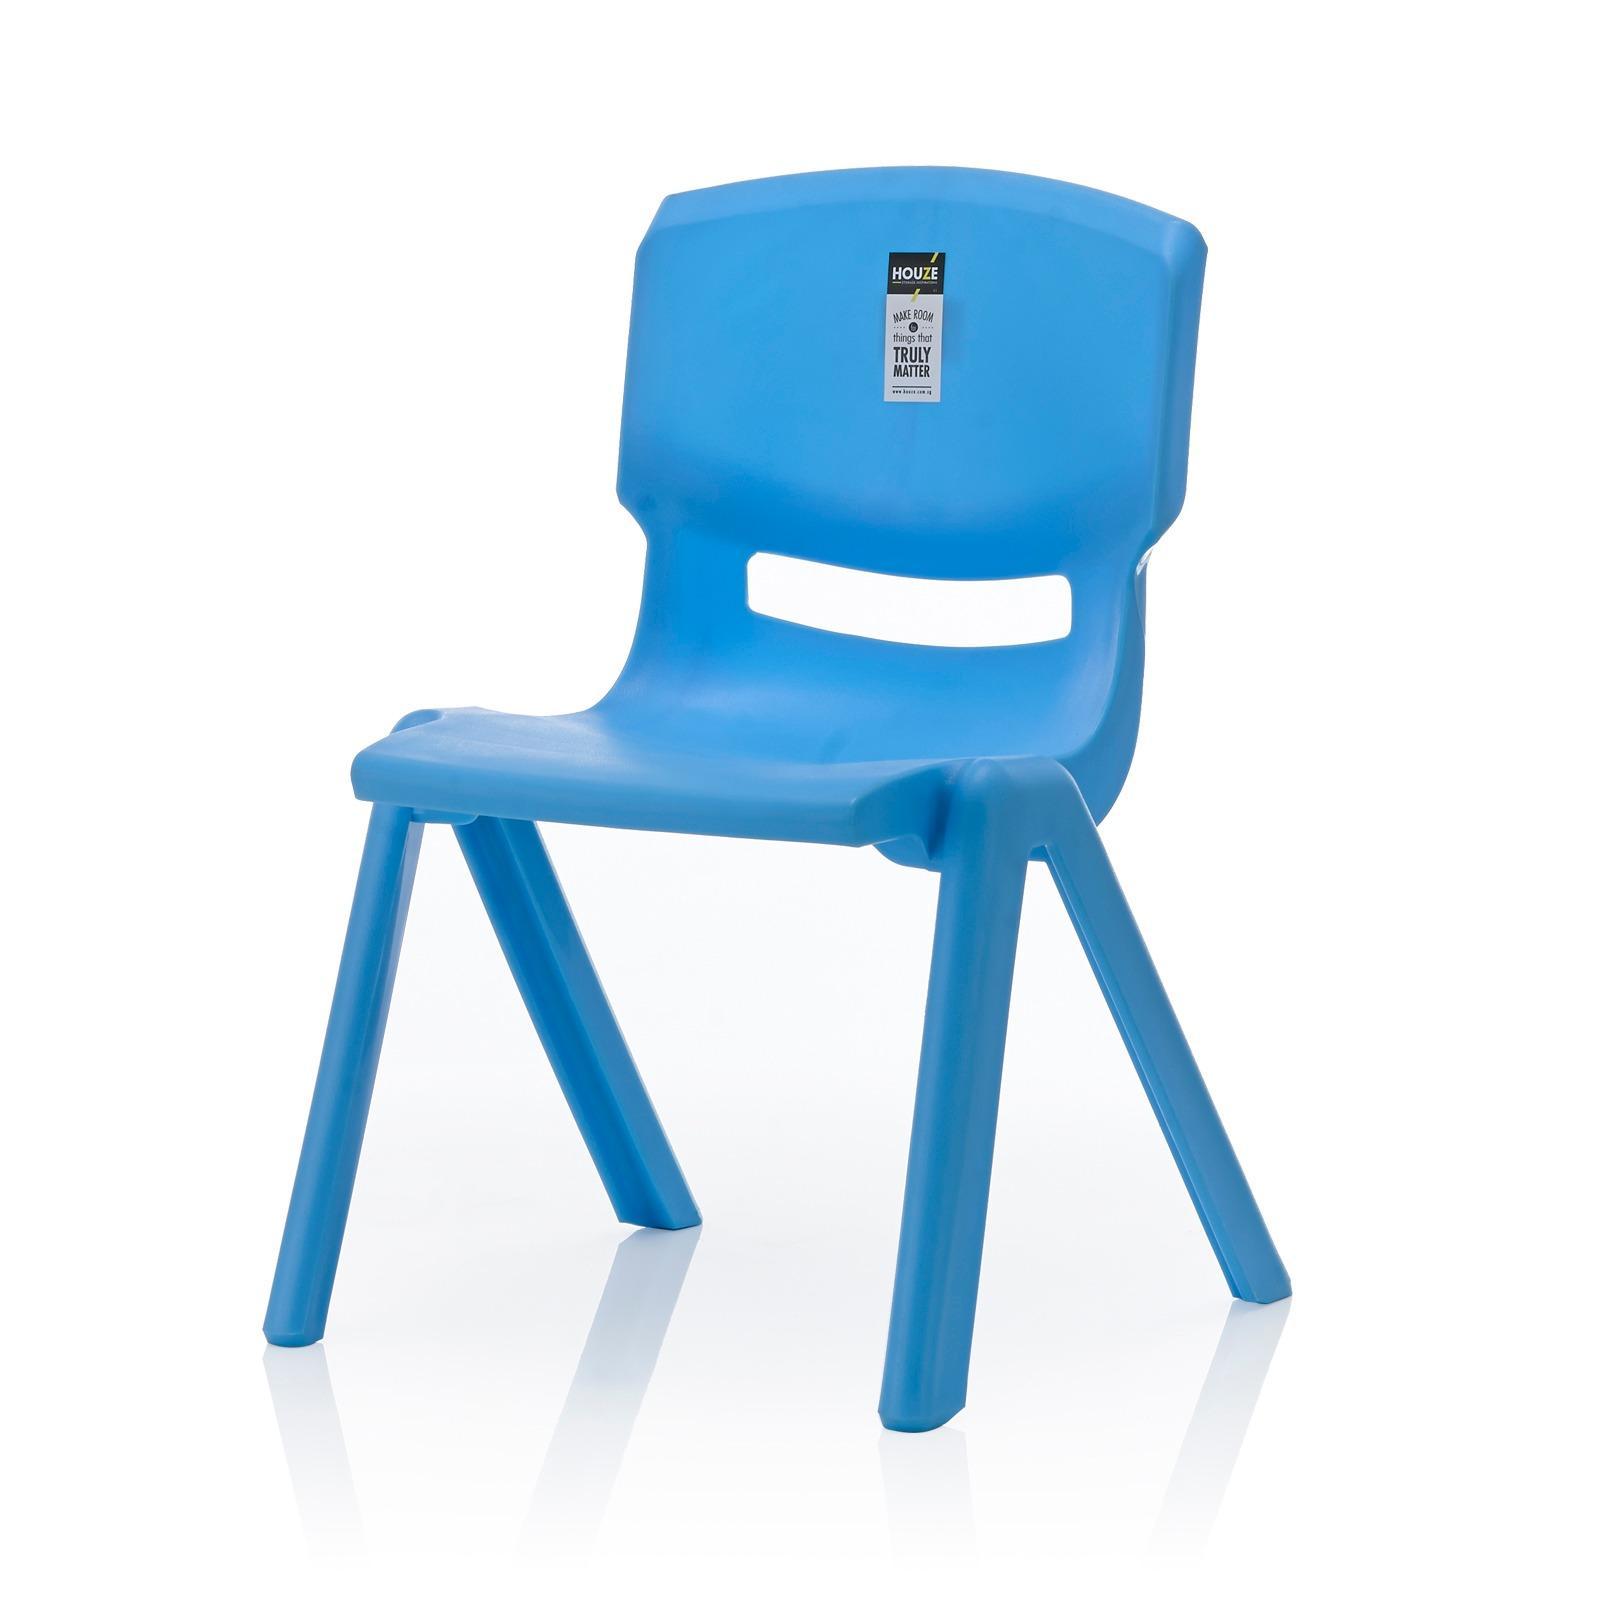 blue kids furniture. HOUZE - Signature Kids Chair With Backrest (Blue) Blue Furniture